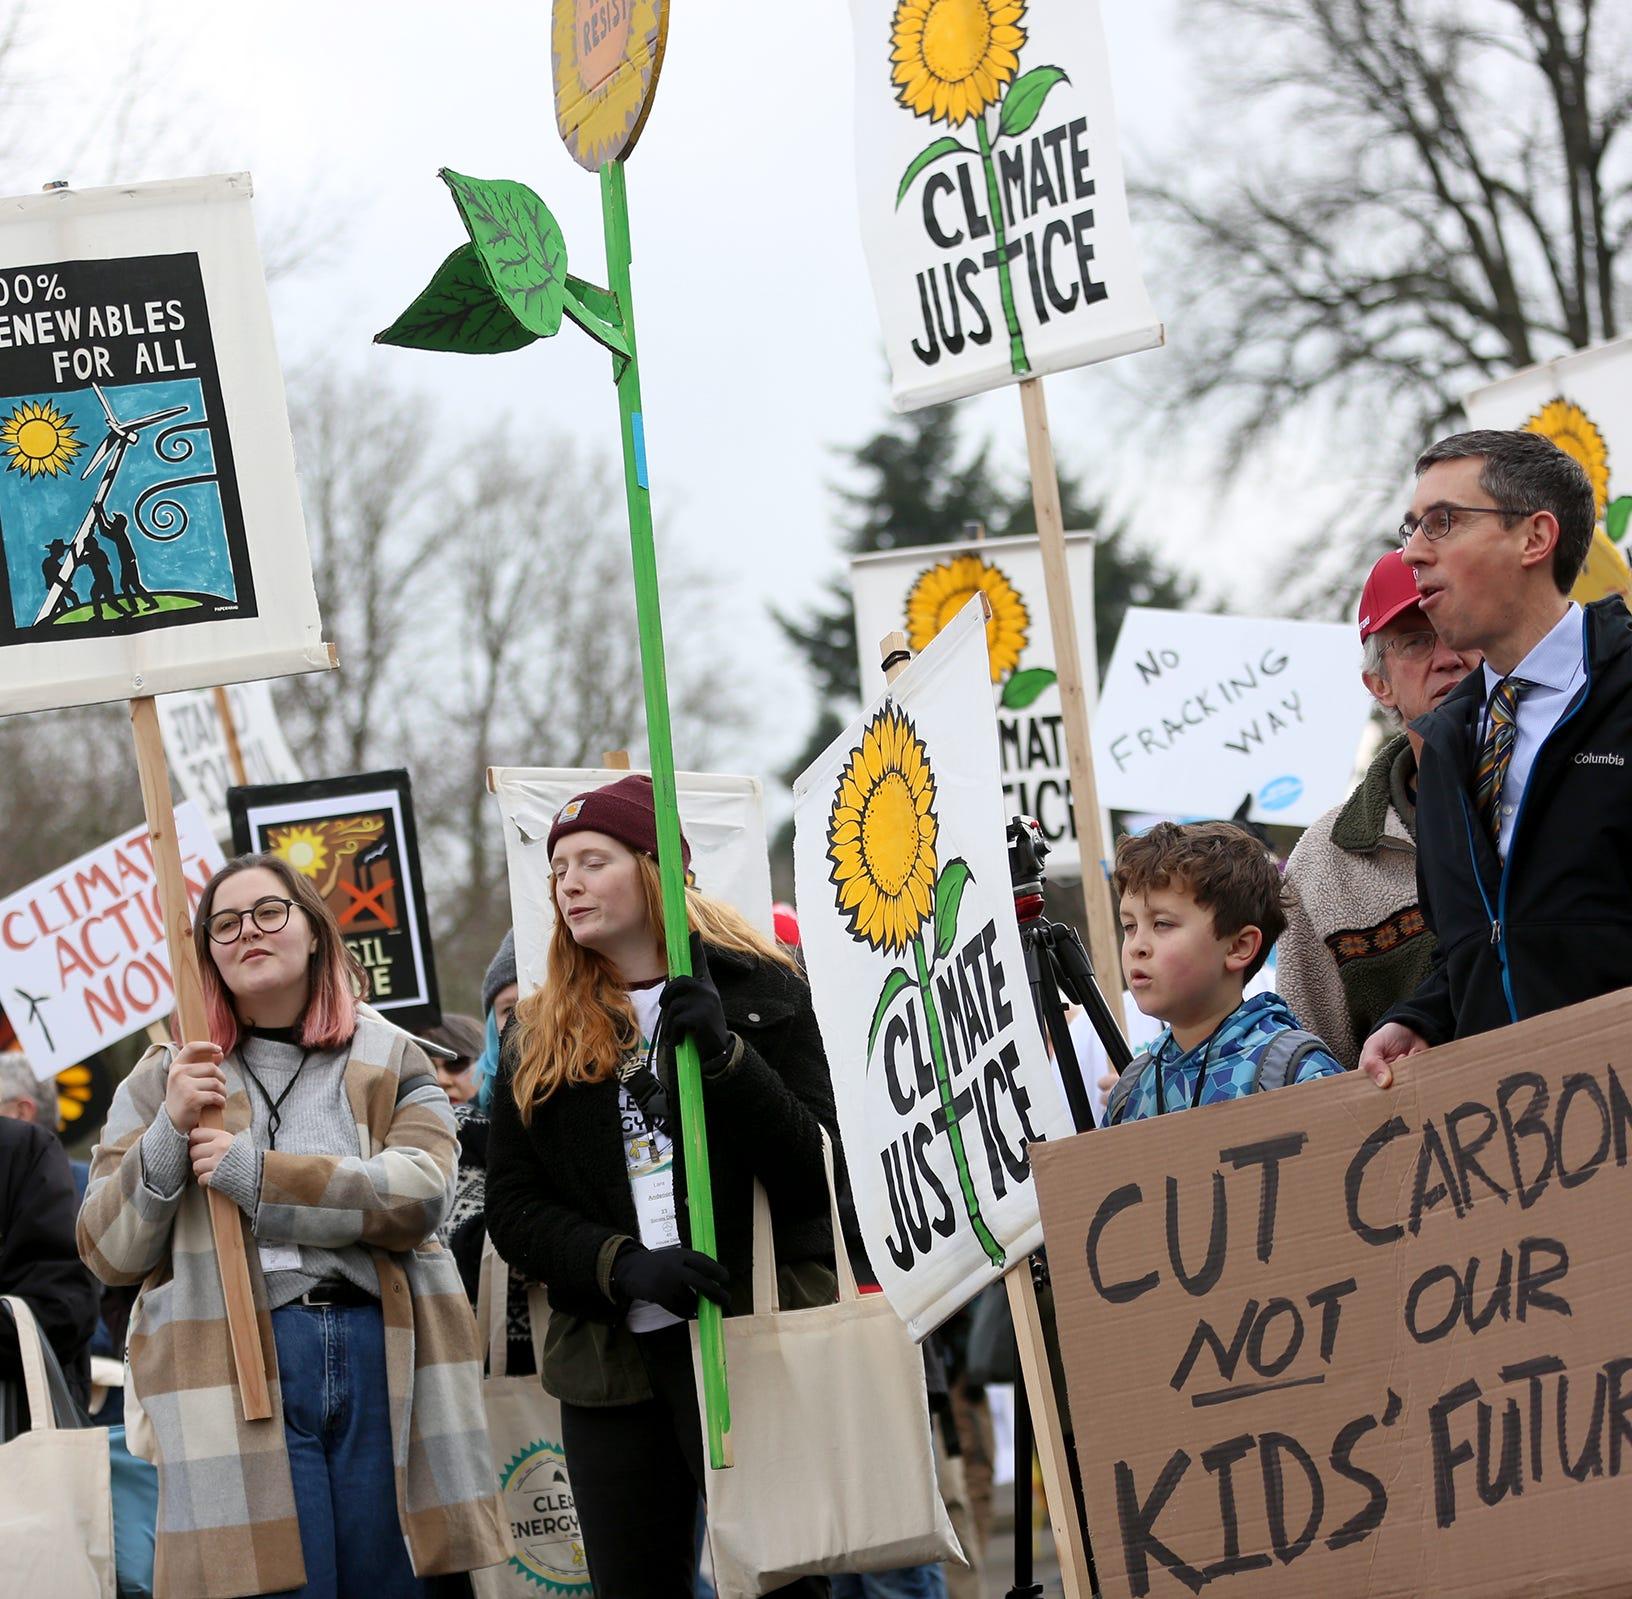 Oregon's carbon emission cap bill gets first hearing, legislators get earful